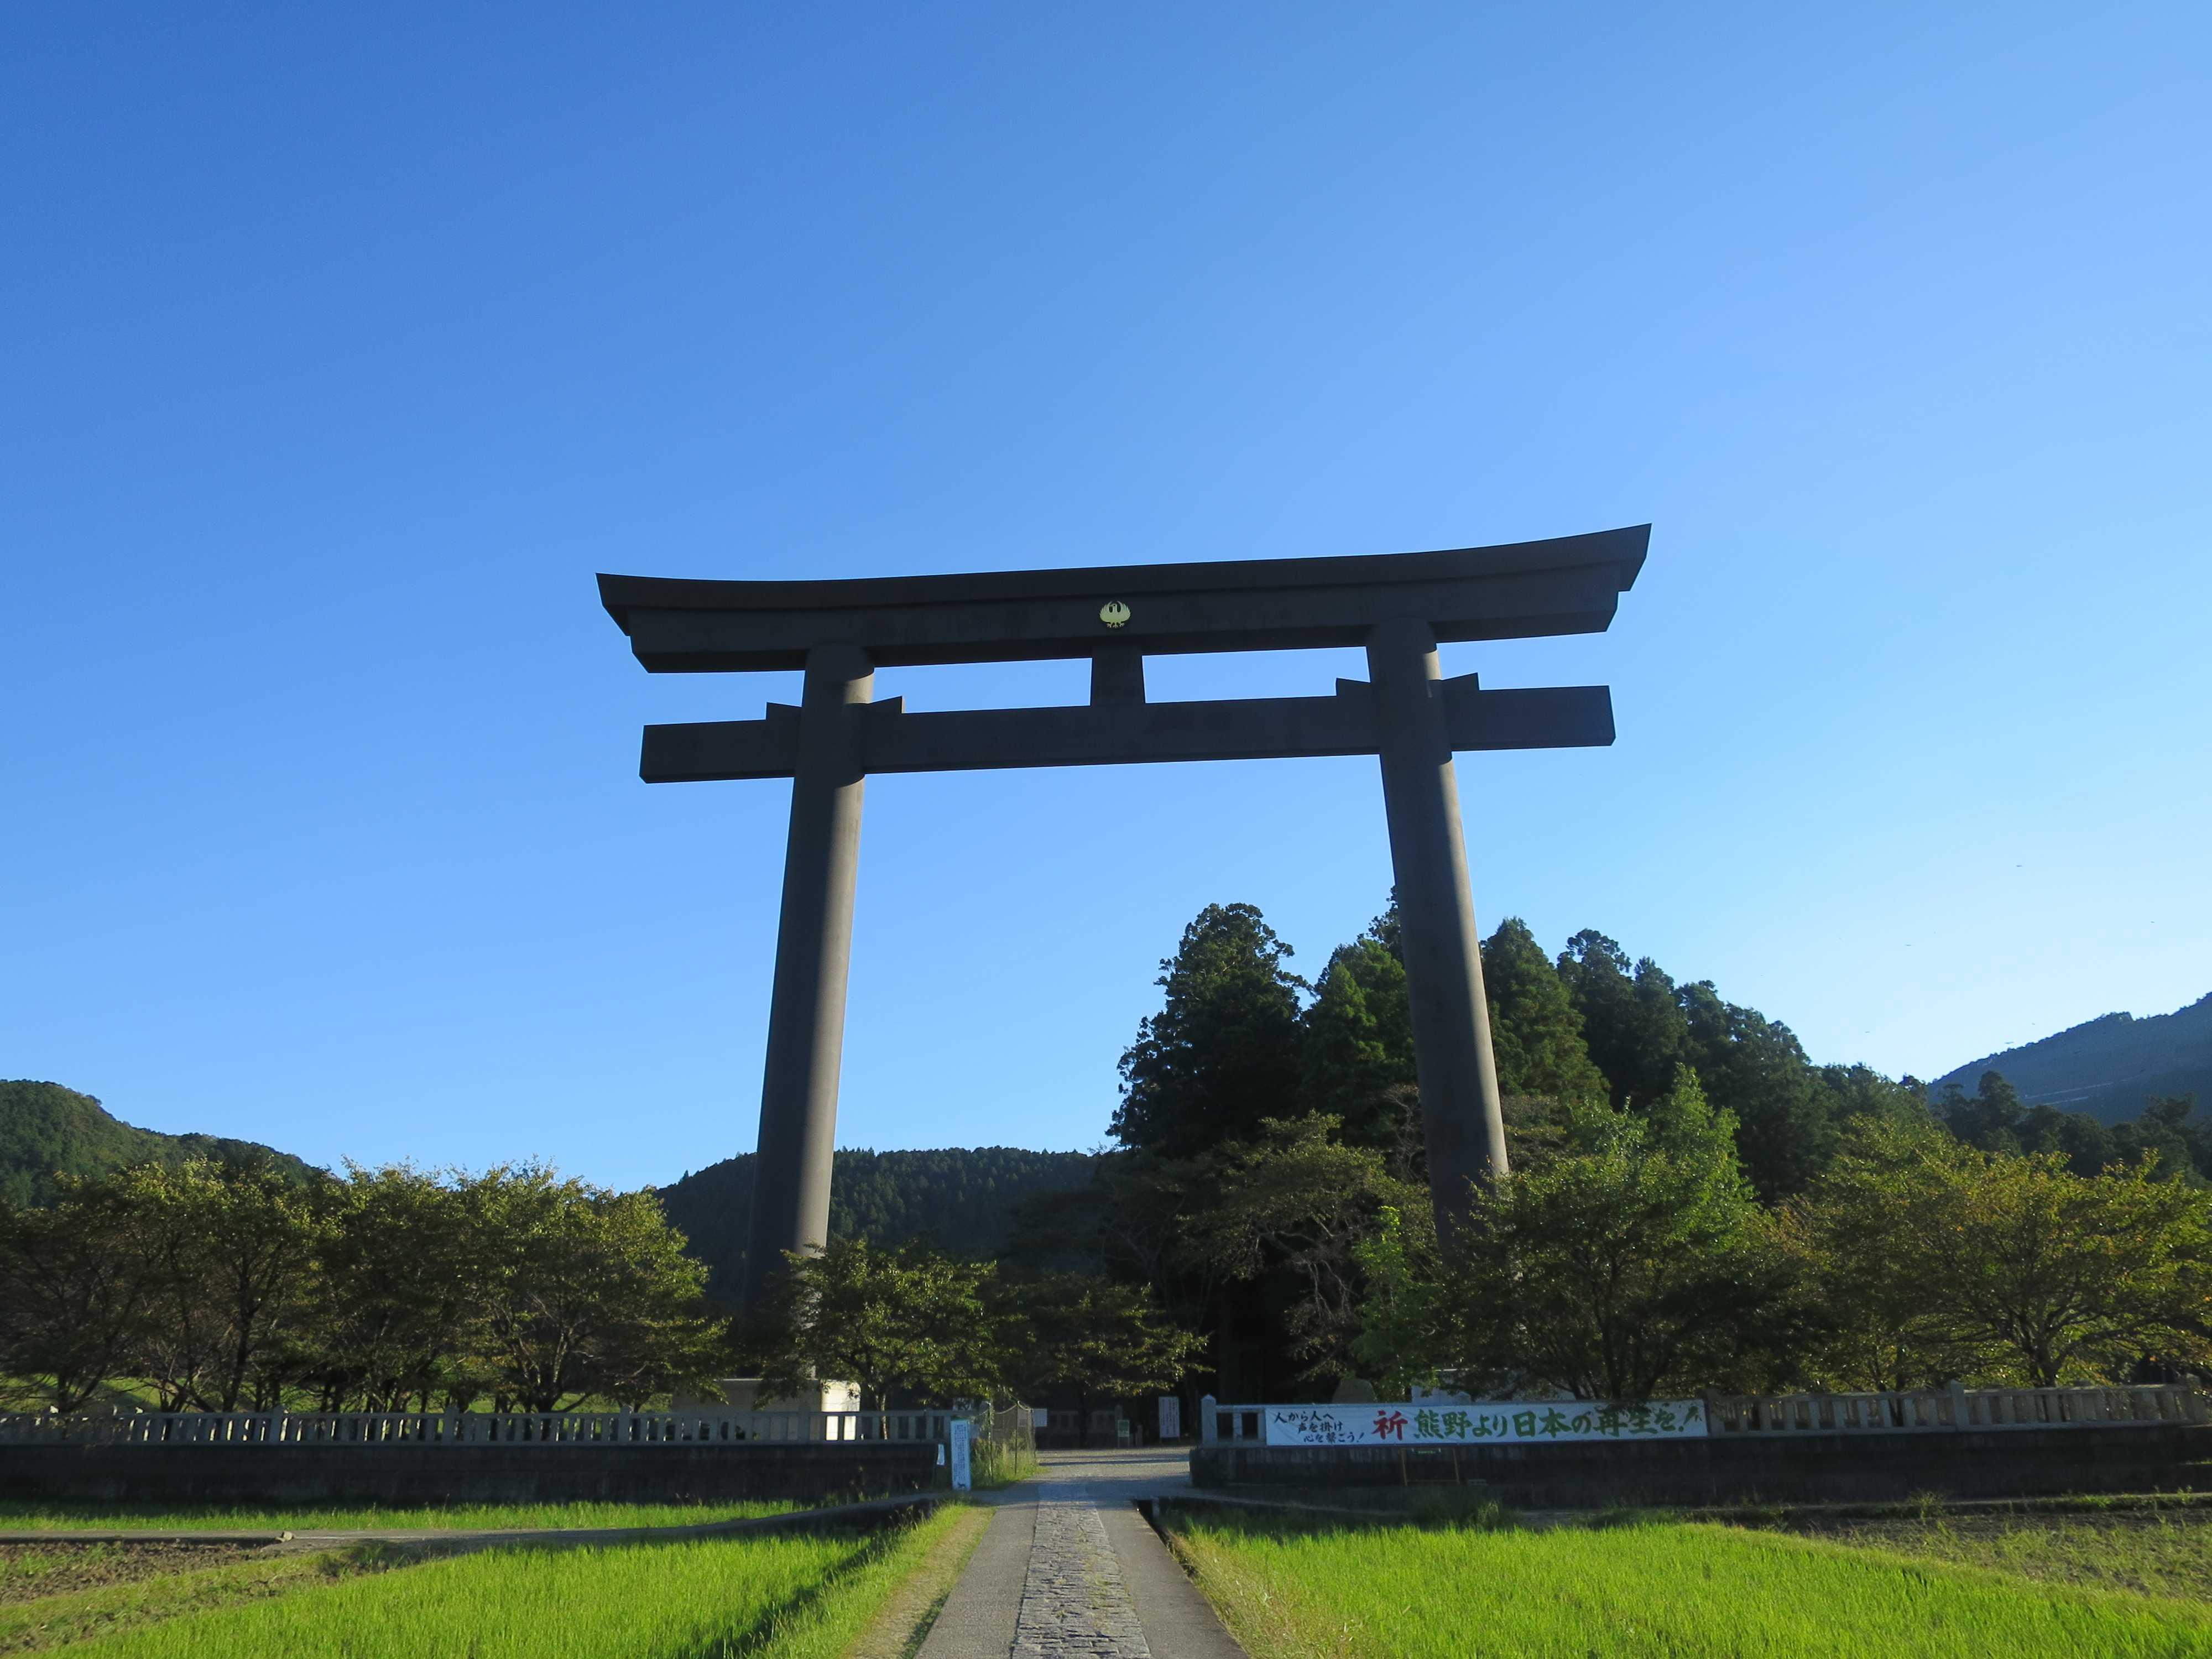 日本一高い大鳥居 33.9m